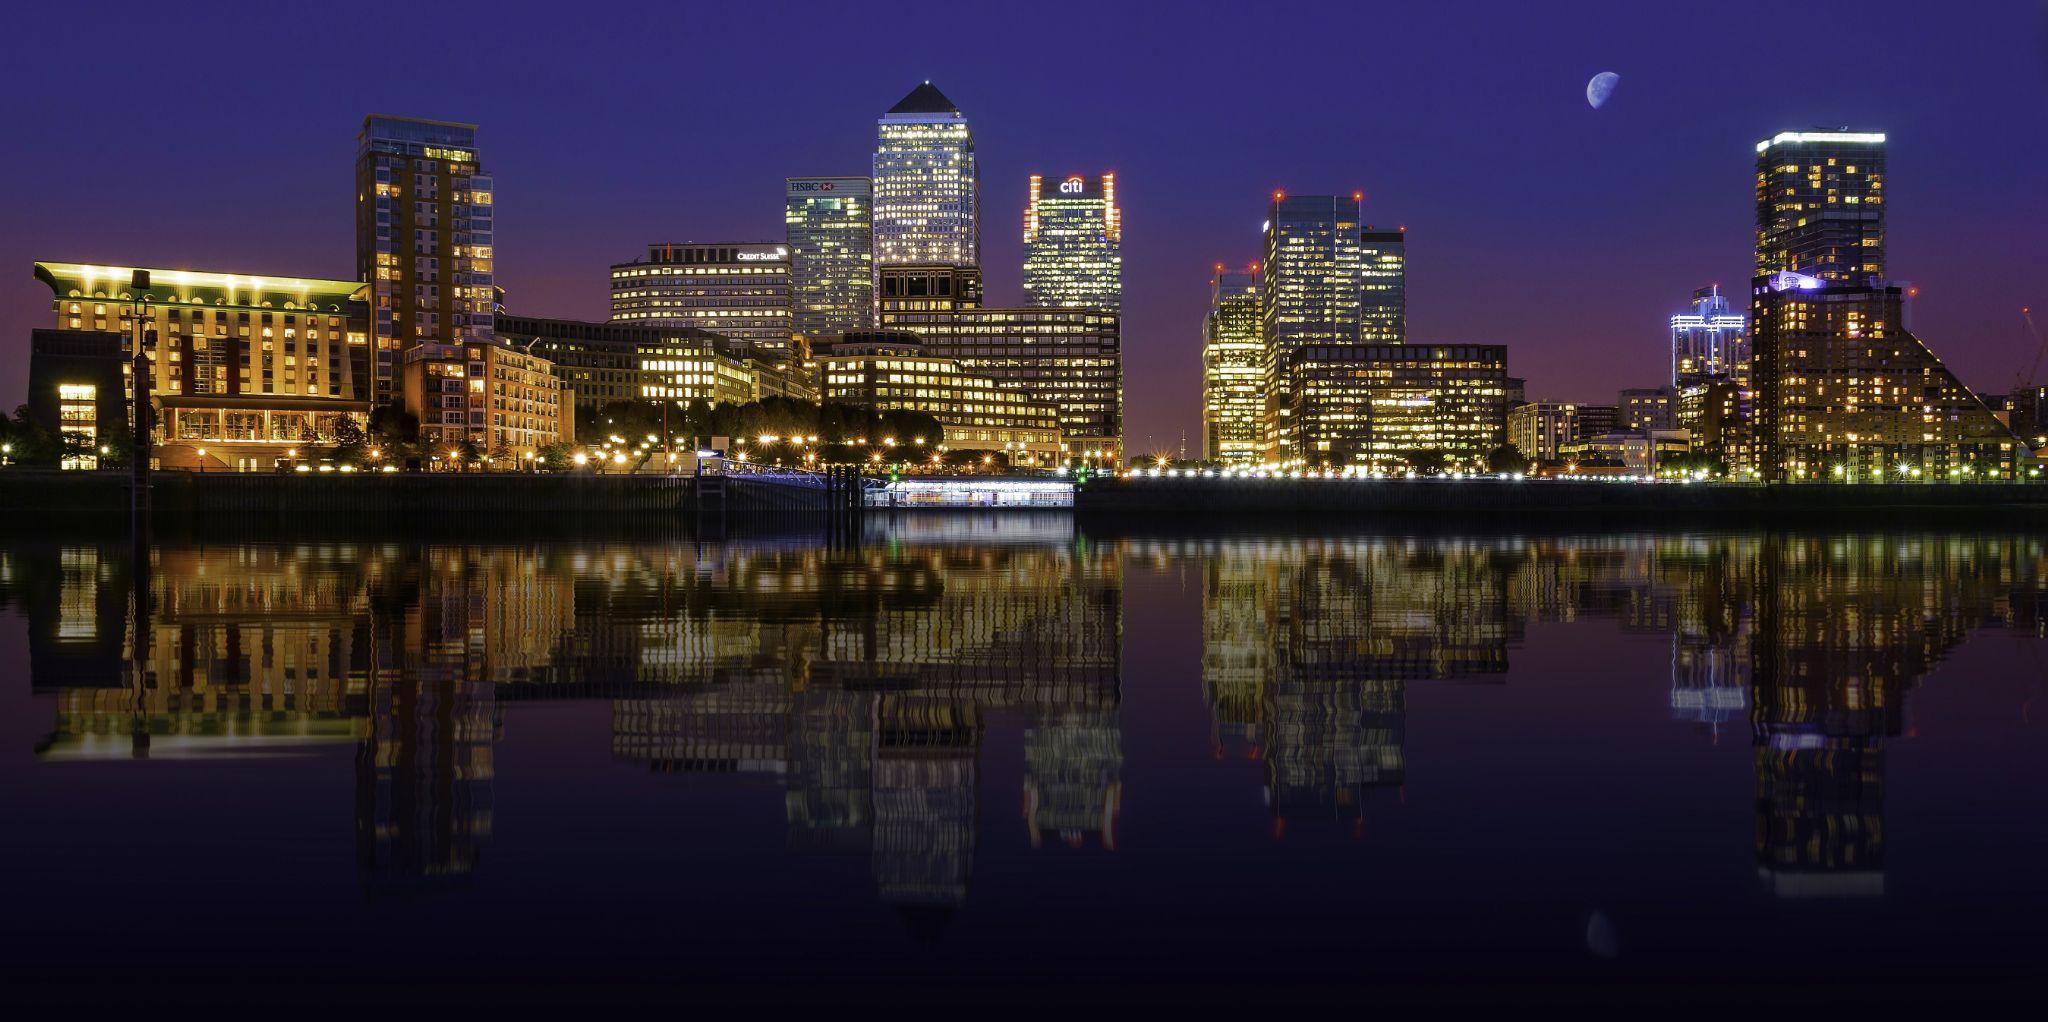 Canary Wharf Reflection by Karl Shepheard